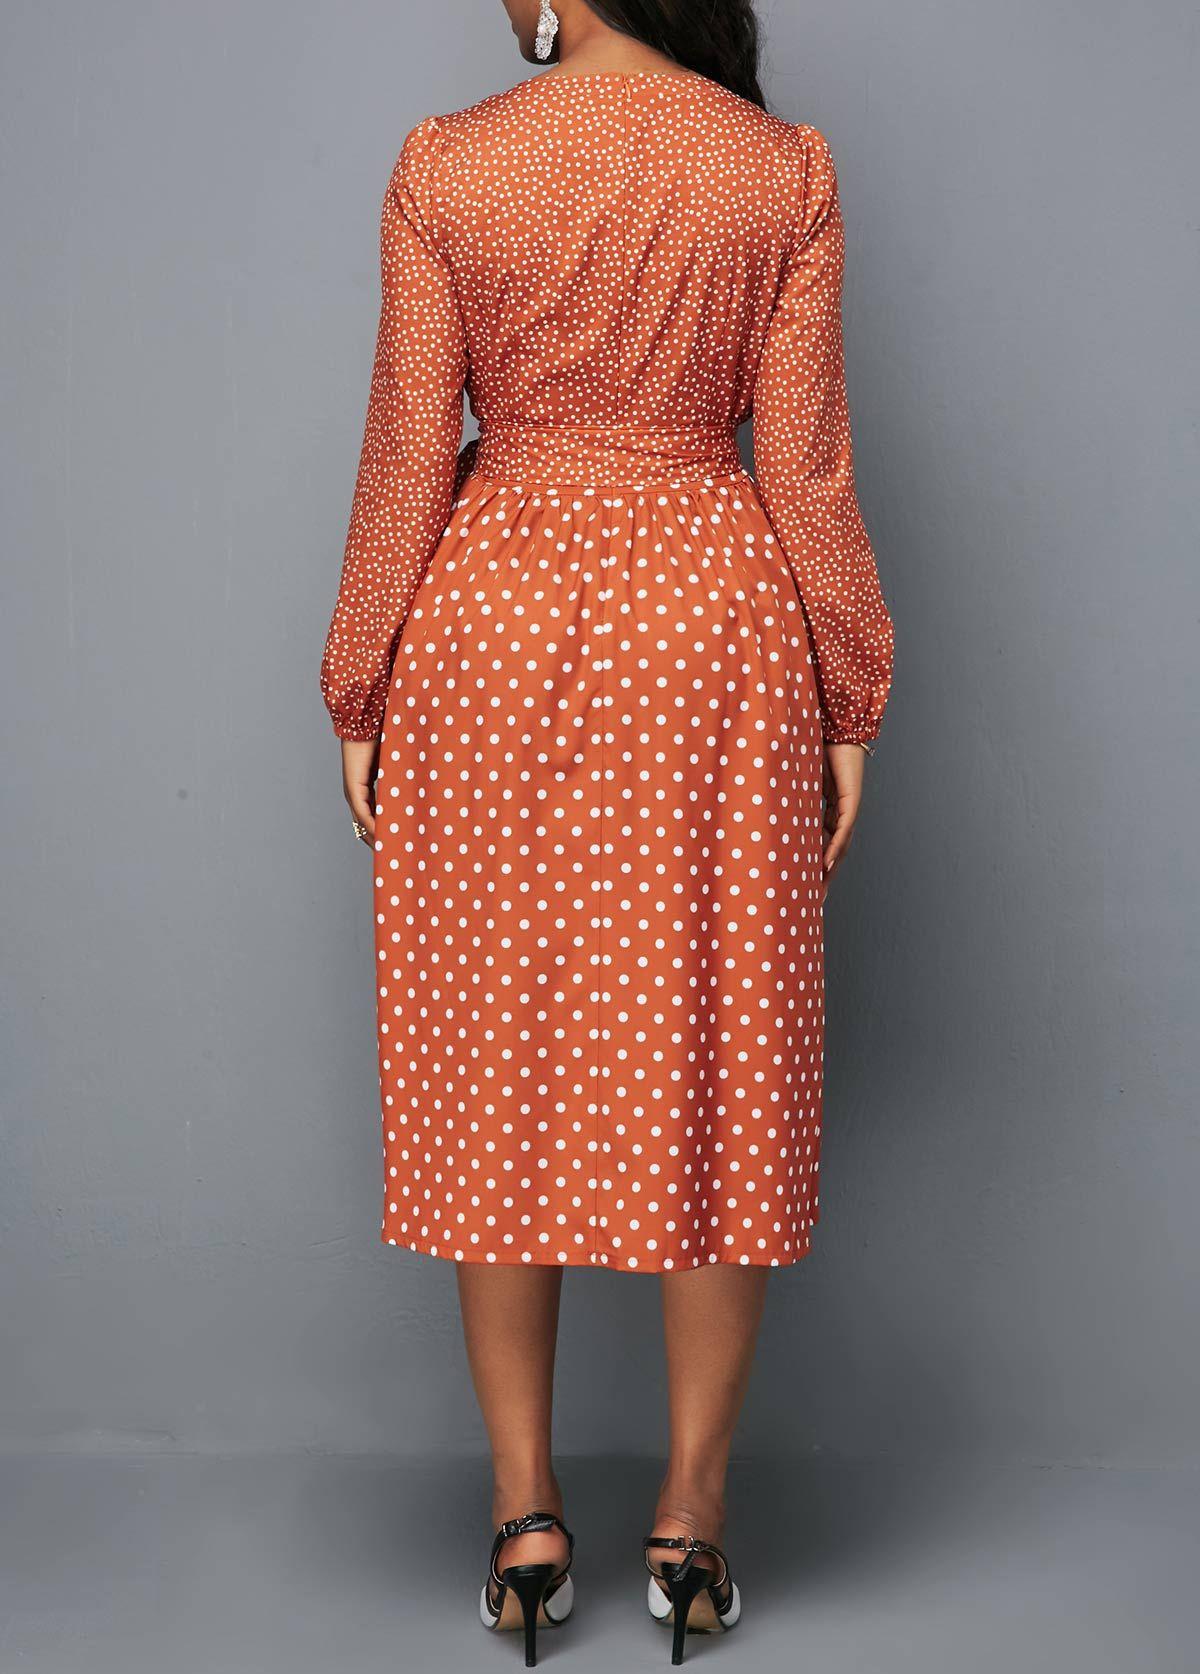 Round Neck Belted Long Sleeve Polka Dot Dress Rotita Com Usd 28 63 Dresses African Fashion Dresses Shop Casual Dresses [ 1674 x 1200 Pixel ]